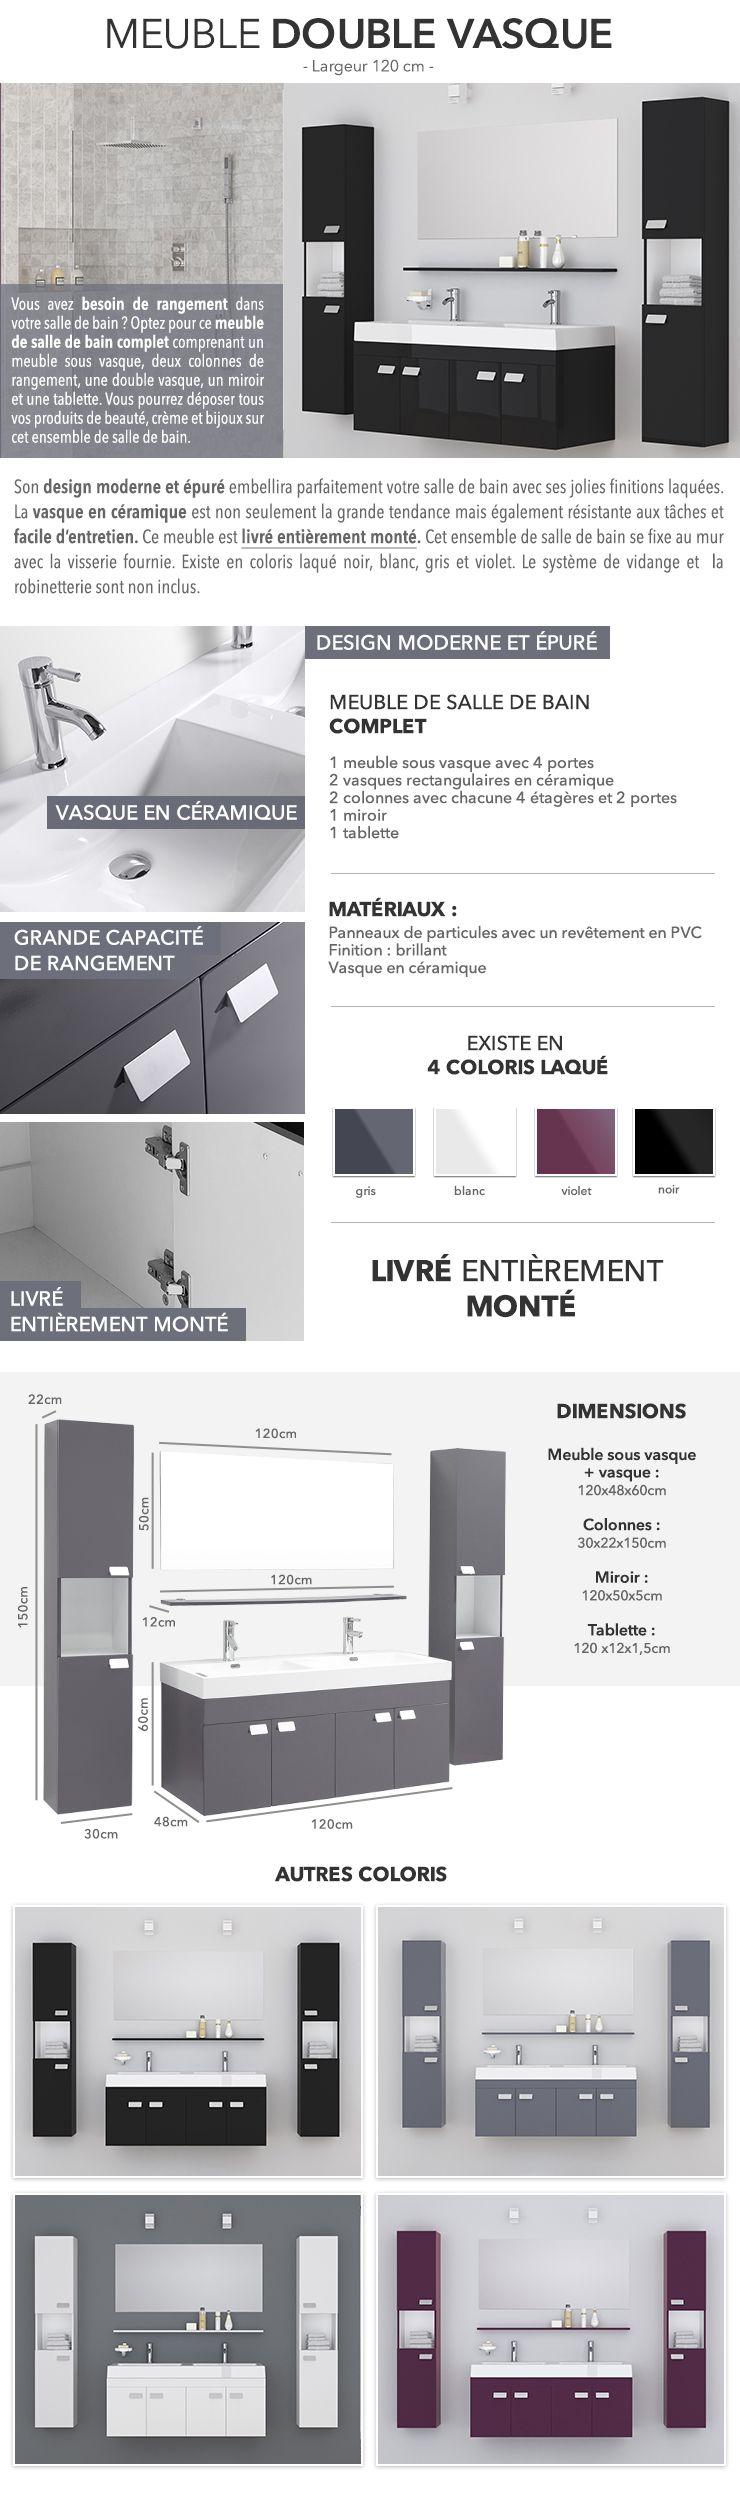 Meuble Salle De Bain Collection Remix Leroy Merlin ~ Alpos Ensemble Salle De Bain Double Vasque Avec Miroir L 120 Cm